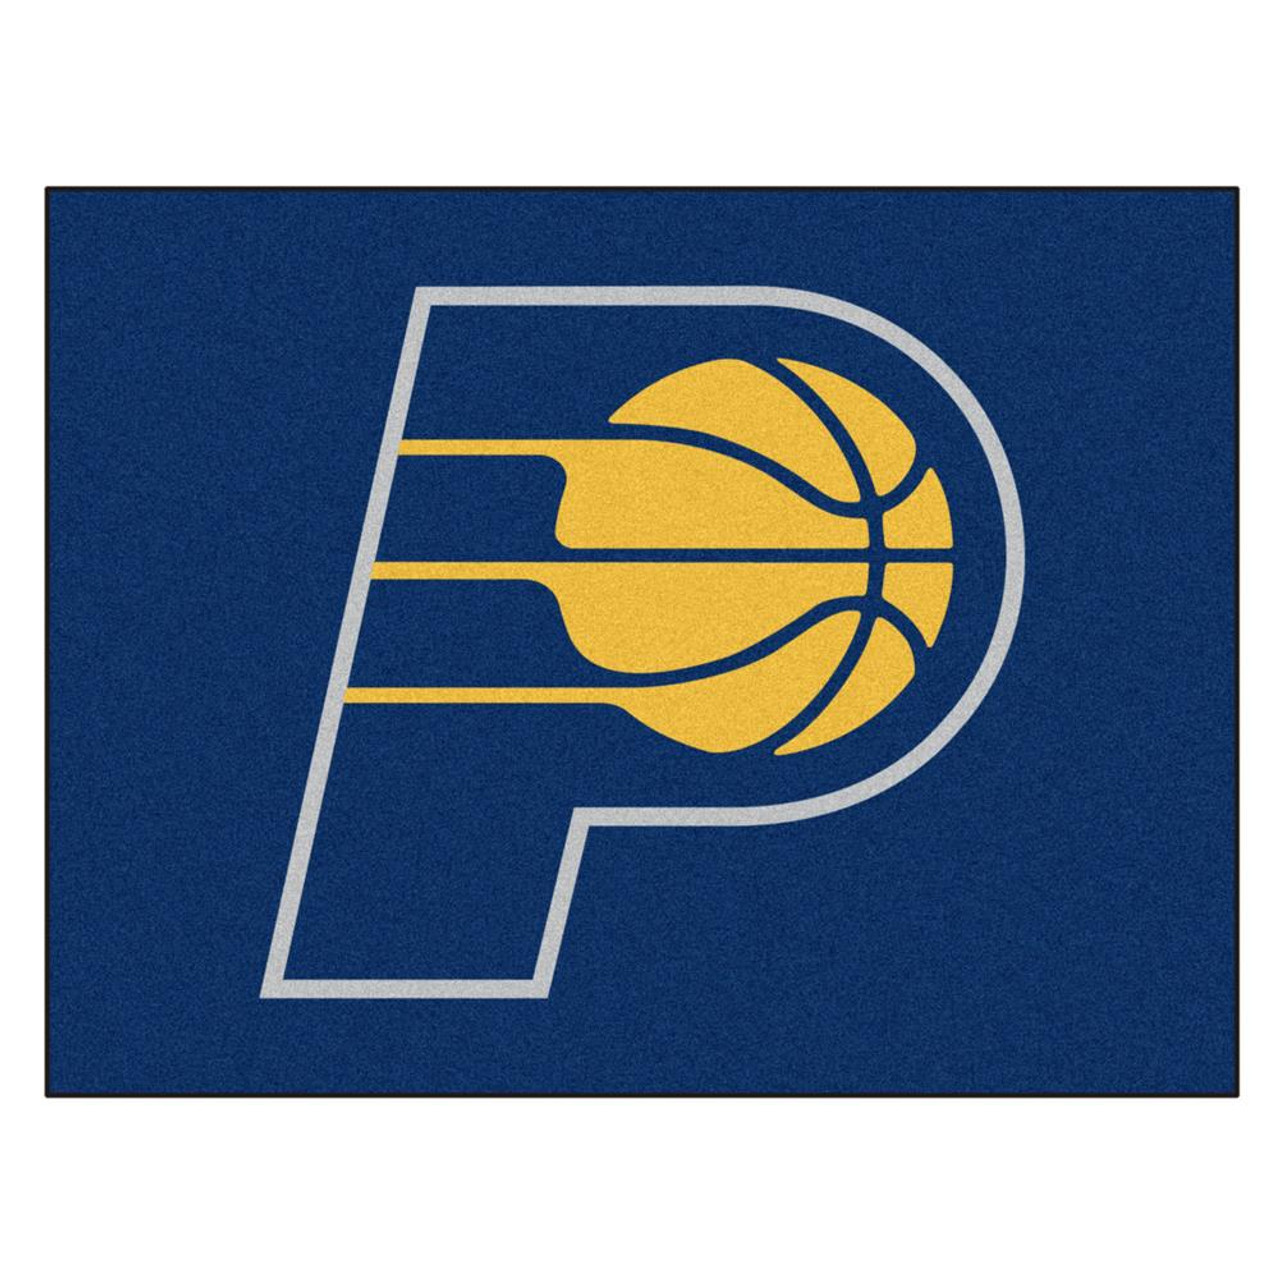 Indiana Pacers Doormat Carpet Area Rug